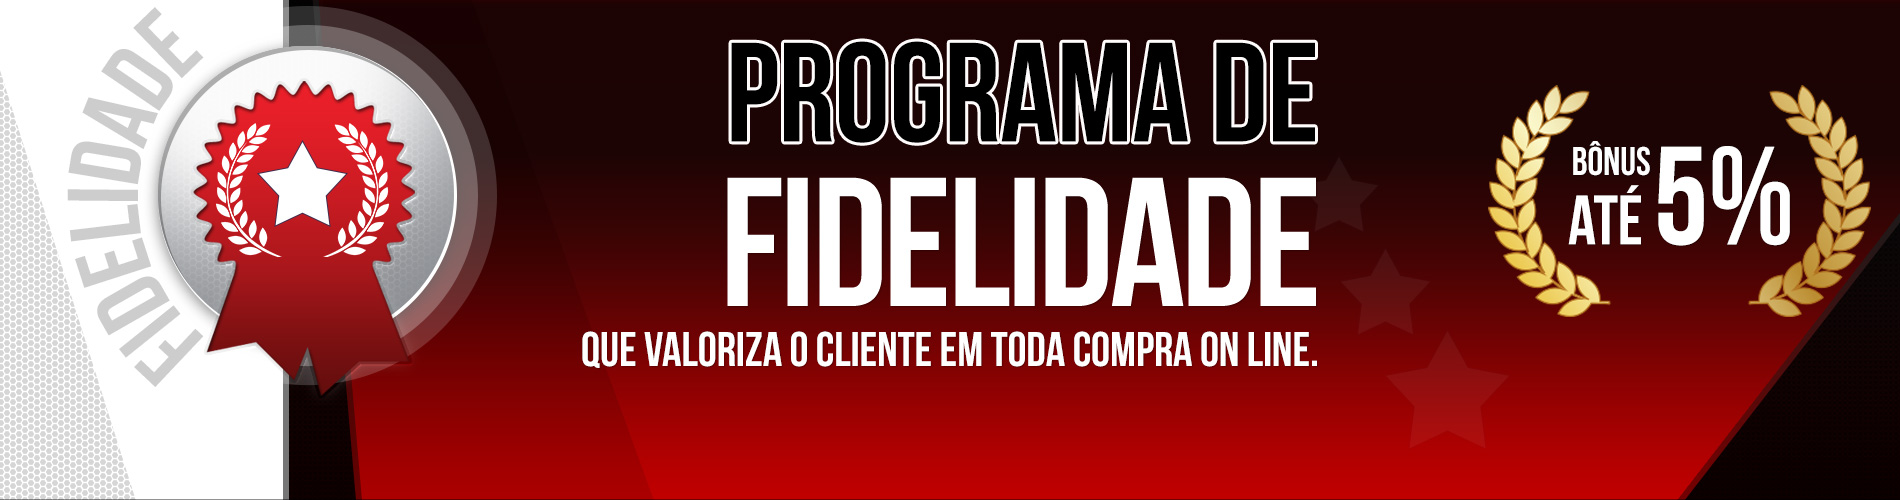 Programa Fidelidade